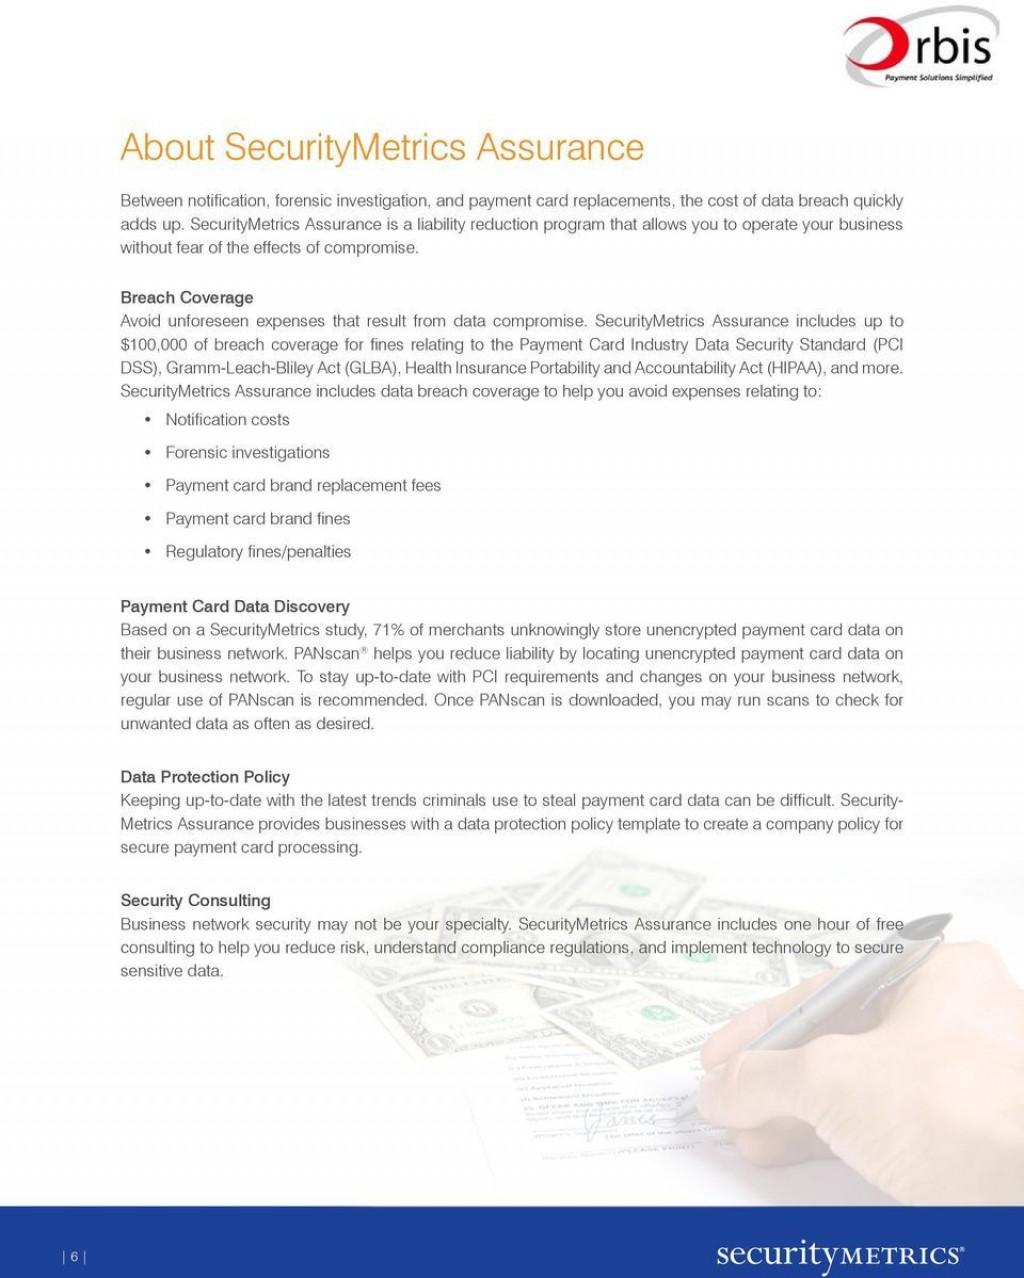 002 Wondrou Data Security Policy Template Example  Uk Center GdprLarge